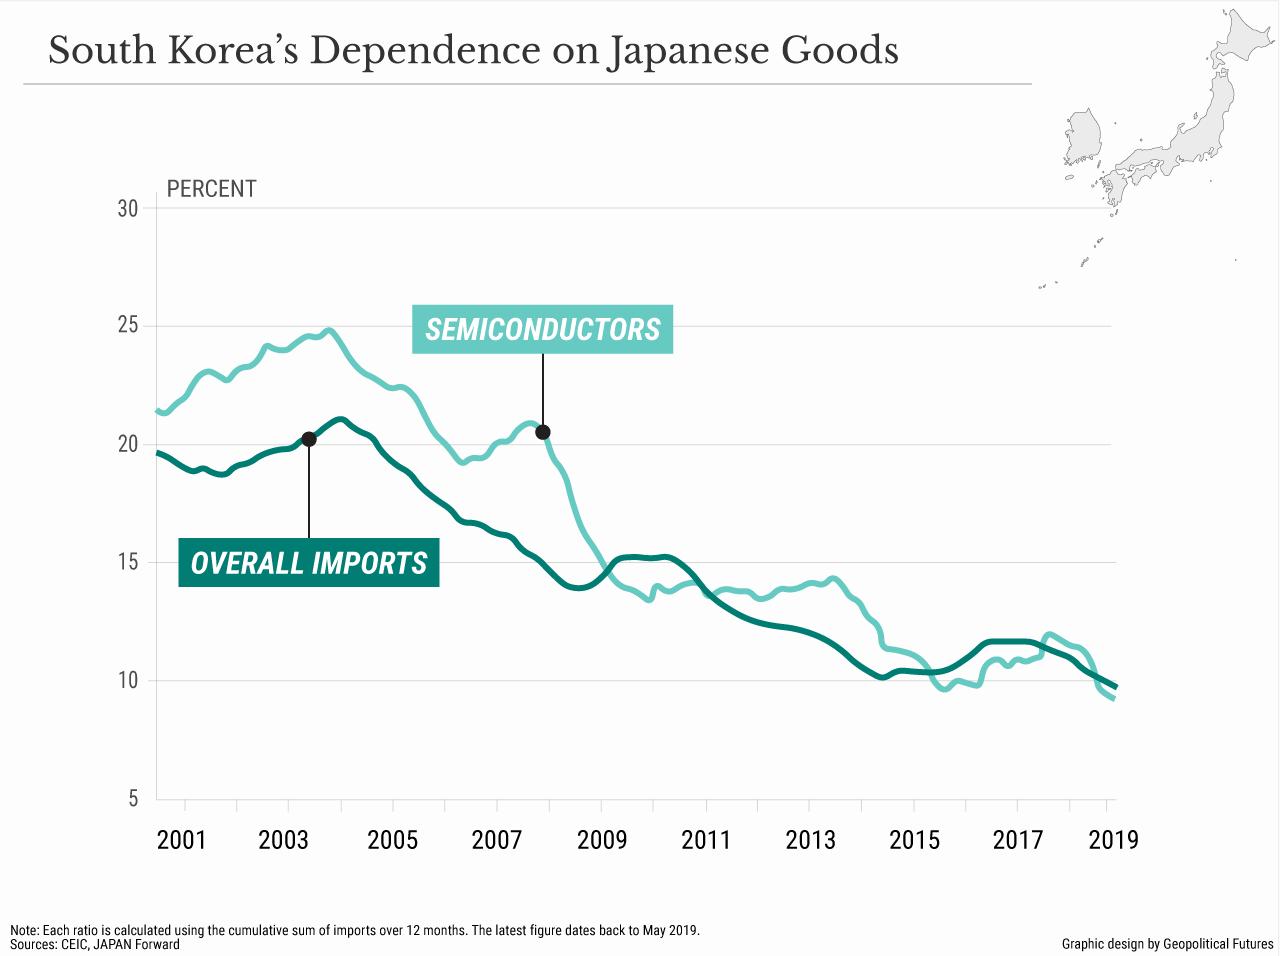 South Korea's Dependence on Japanese Goods